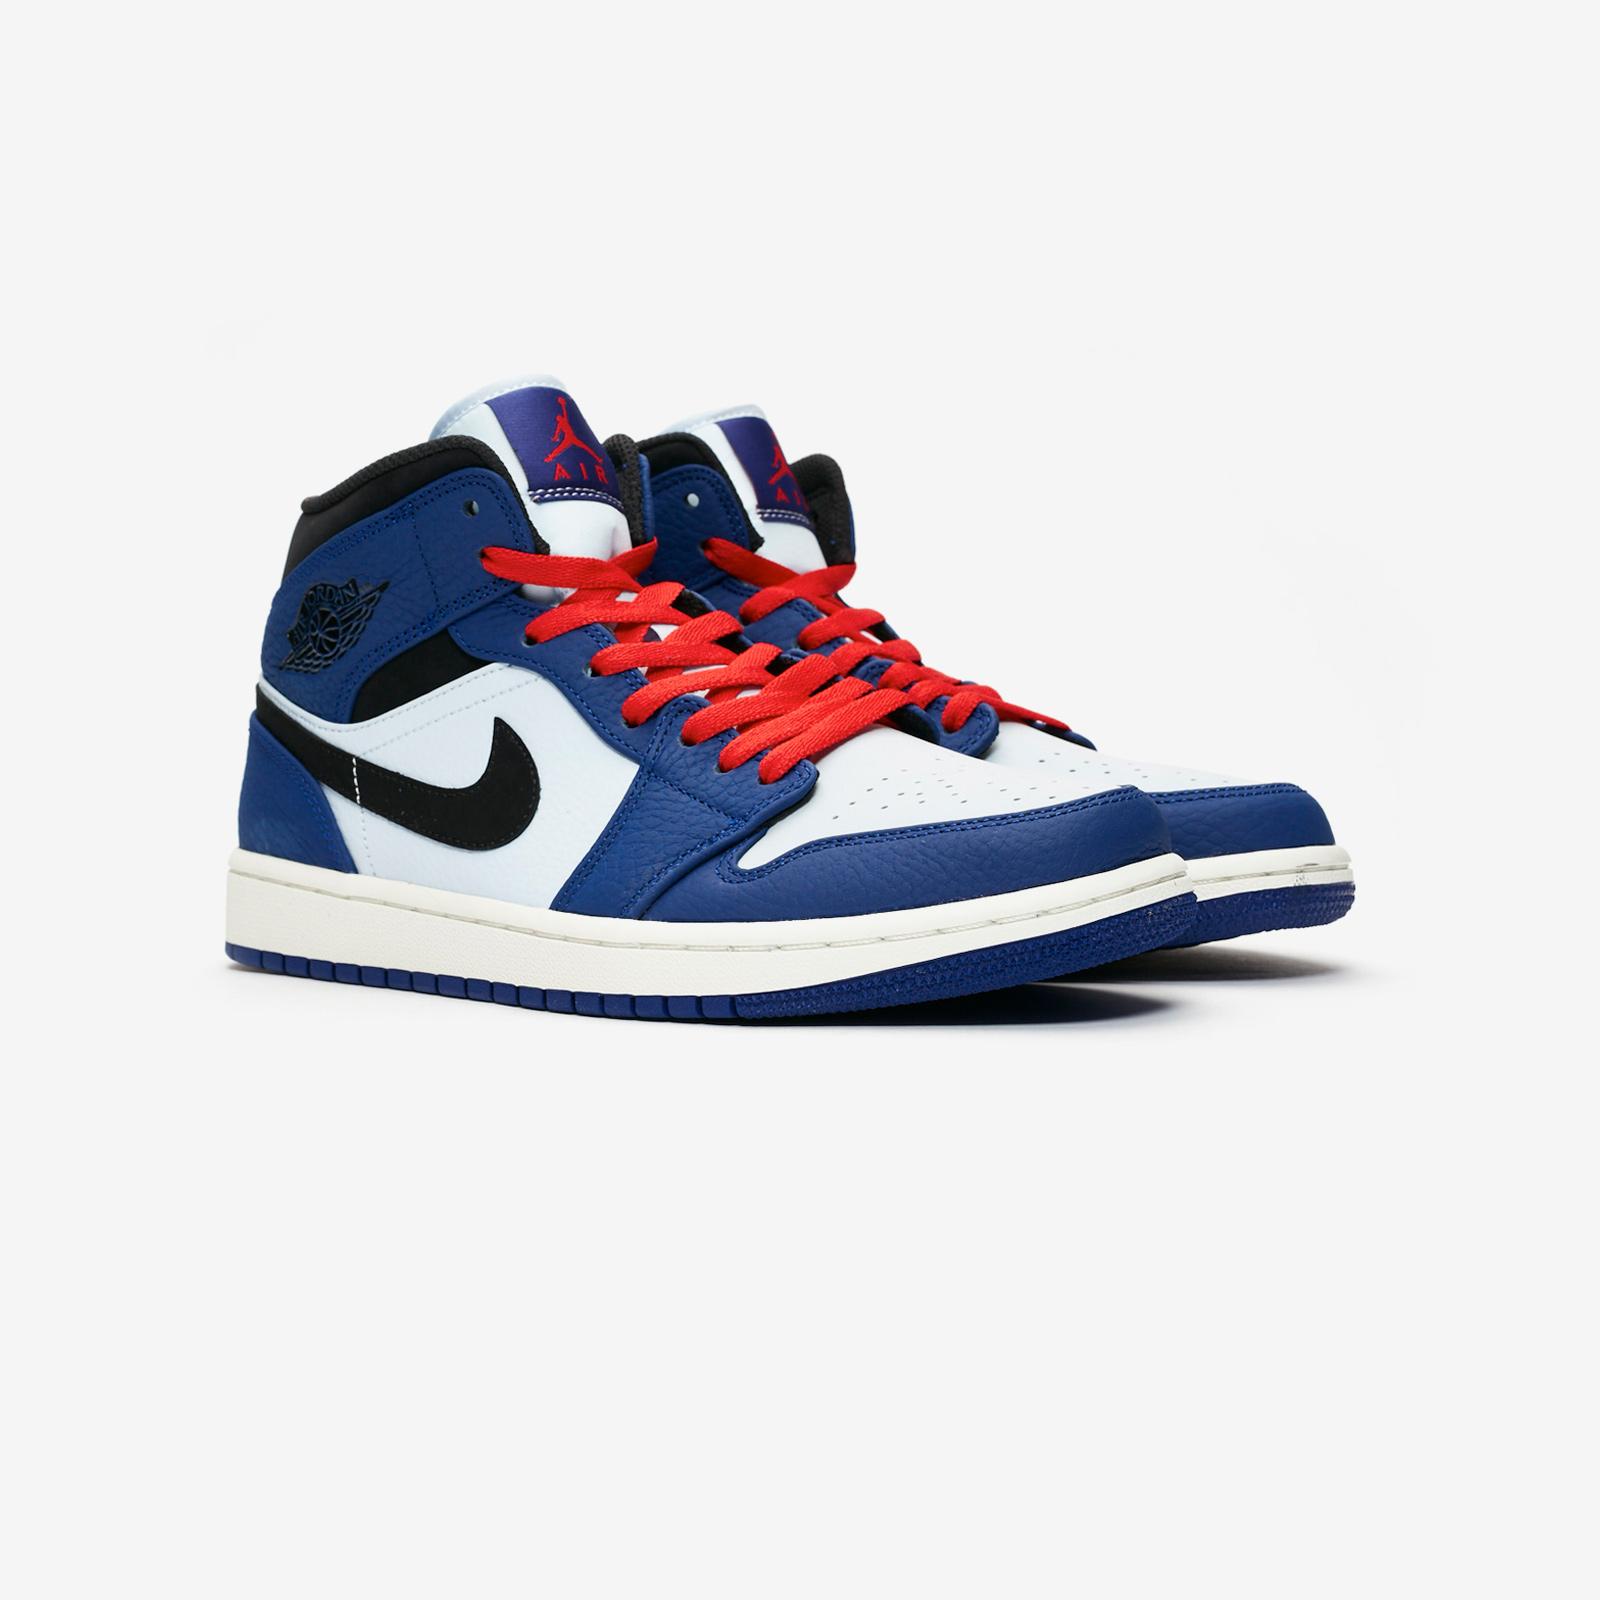 3be4fbe4513ffb Jordan Brand Air Jordan 1 Mid SE - 852542-400 - Sneakersnstuff ...